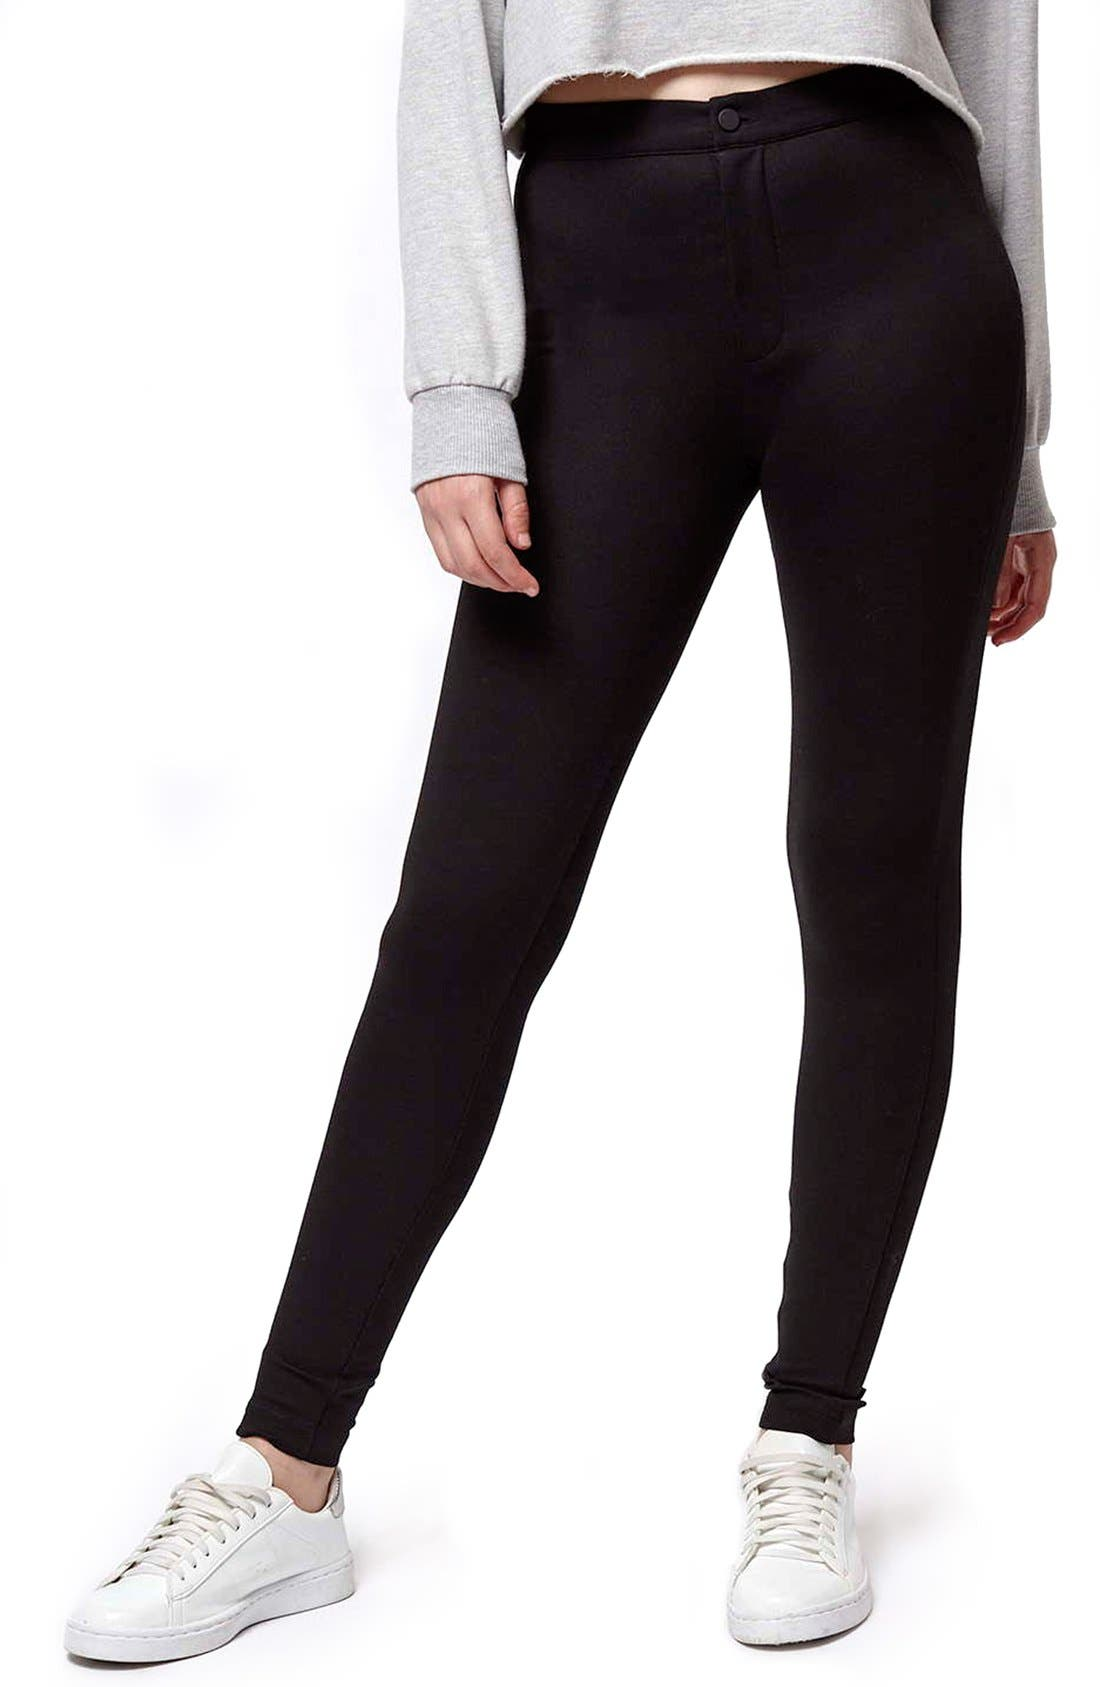 Main Image - Topshop Seamed Ponte Trouser Leggings